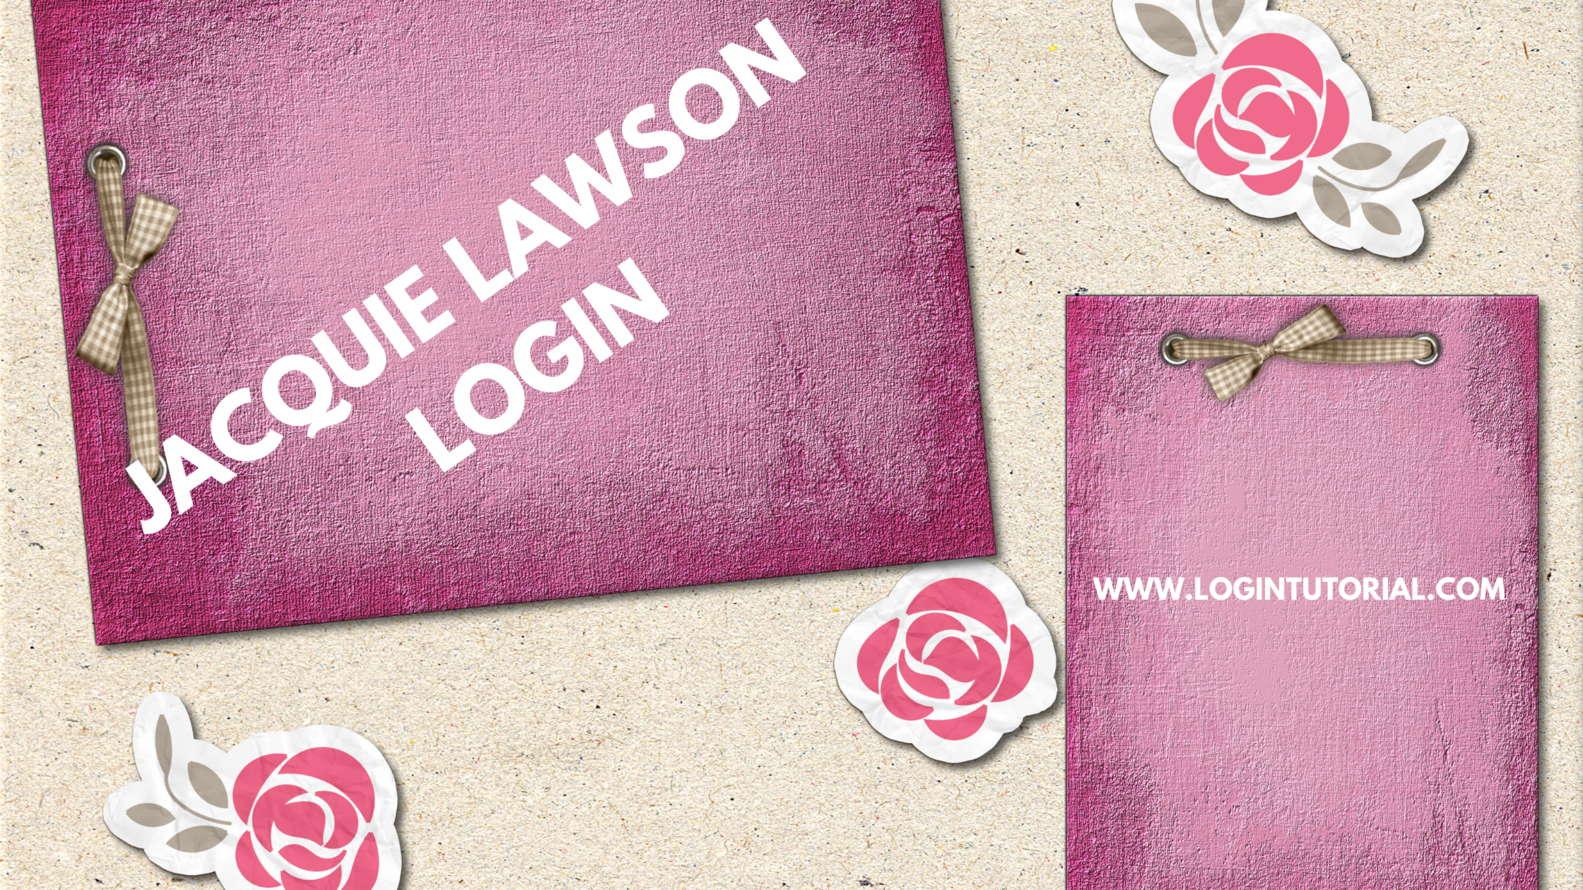 Jacquie Lawson Login